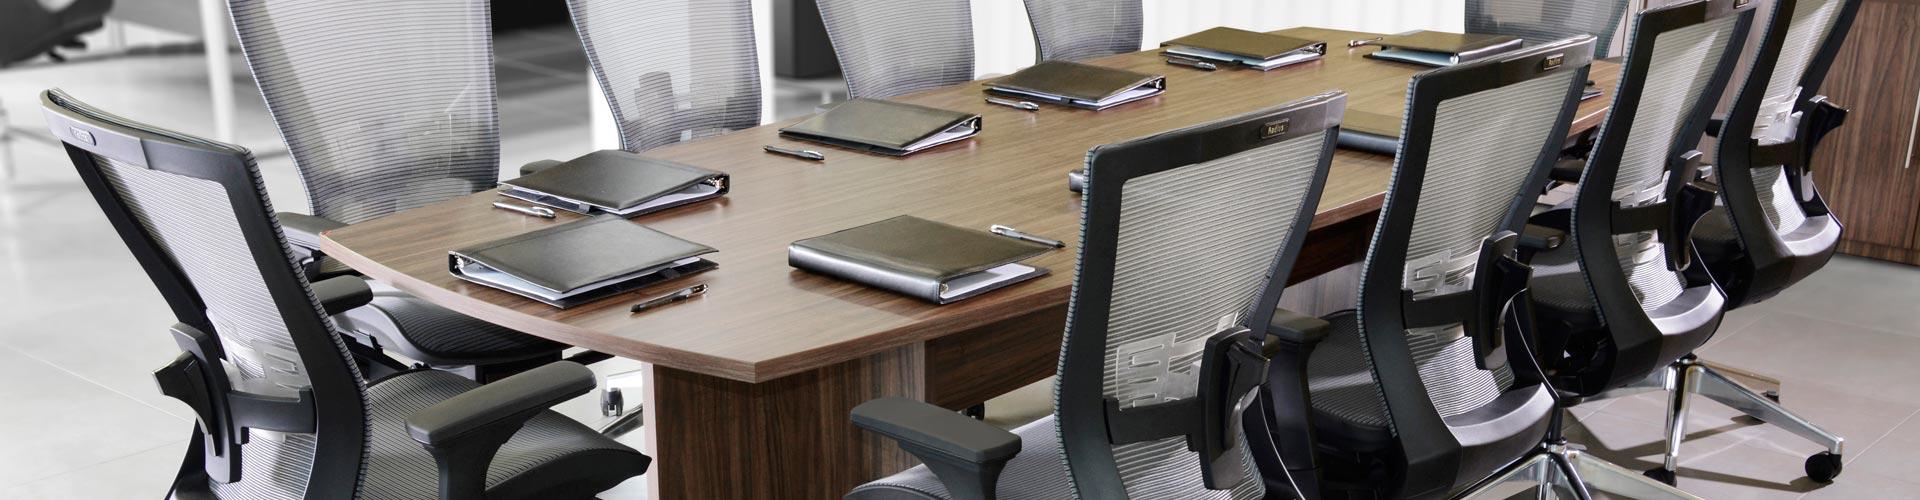 Muebles para oficina df muebles para oficina en m xico for Muebles de oficina silieri koncept